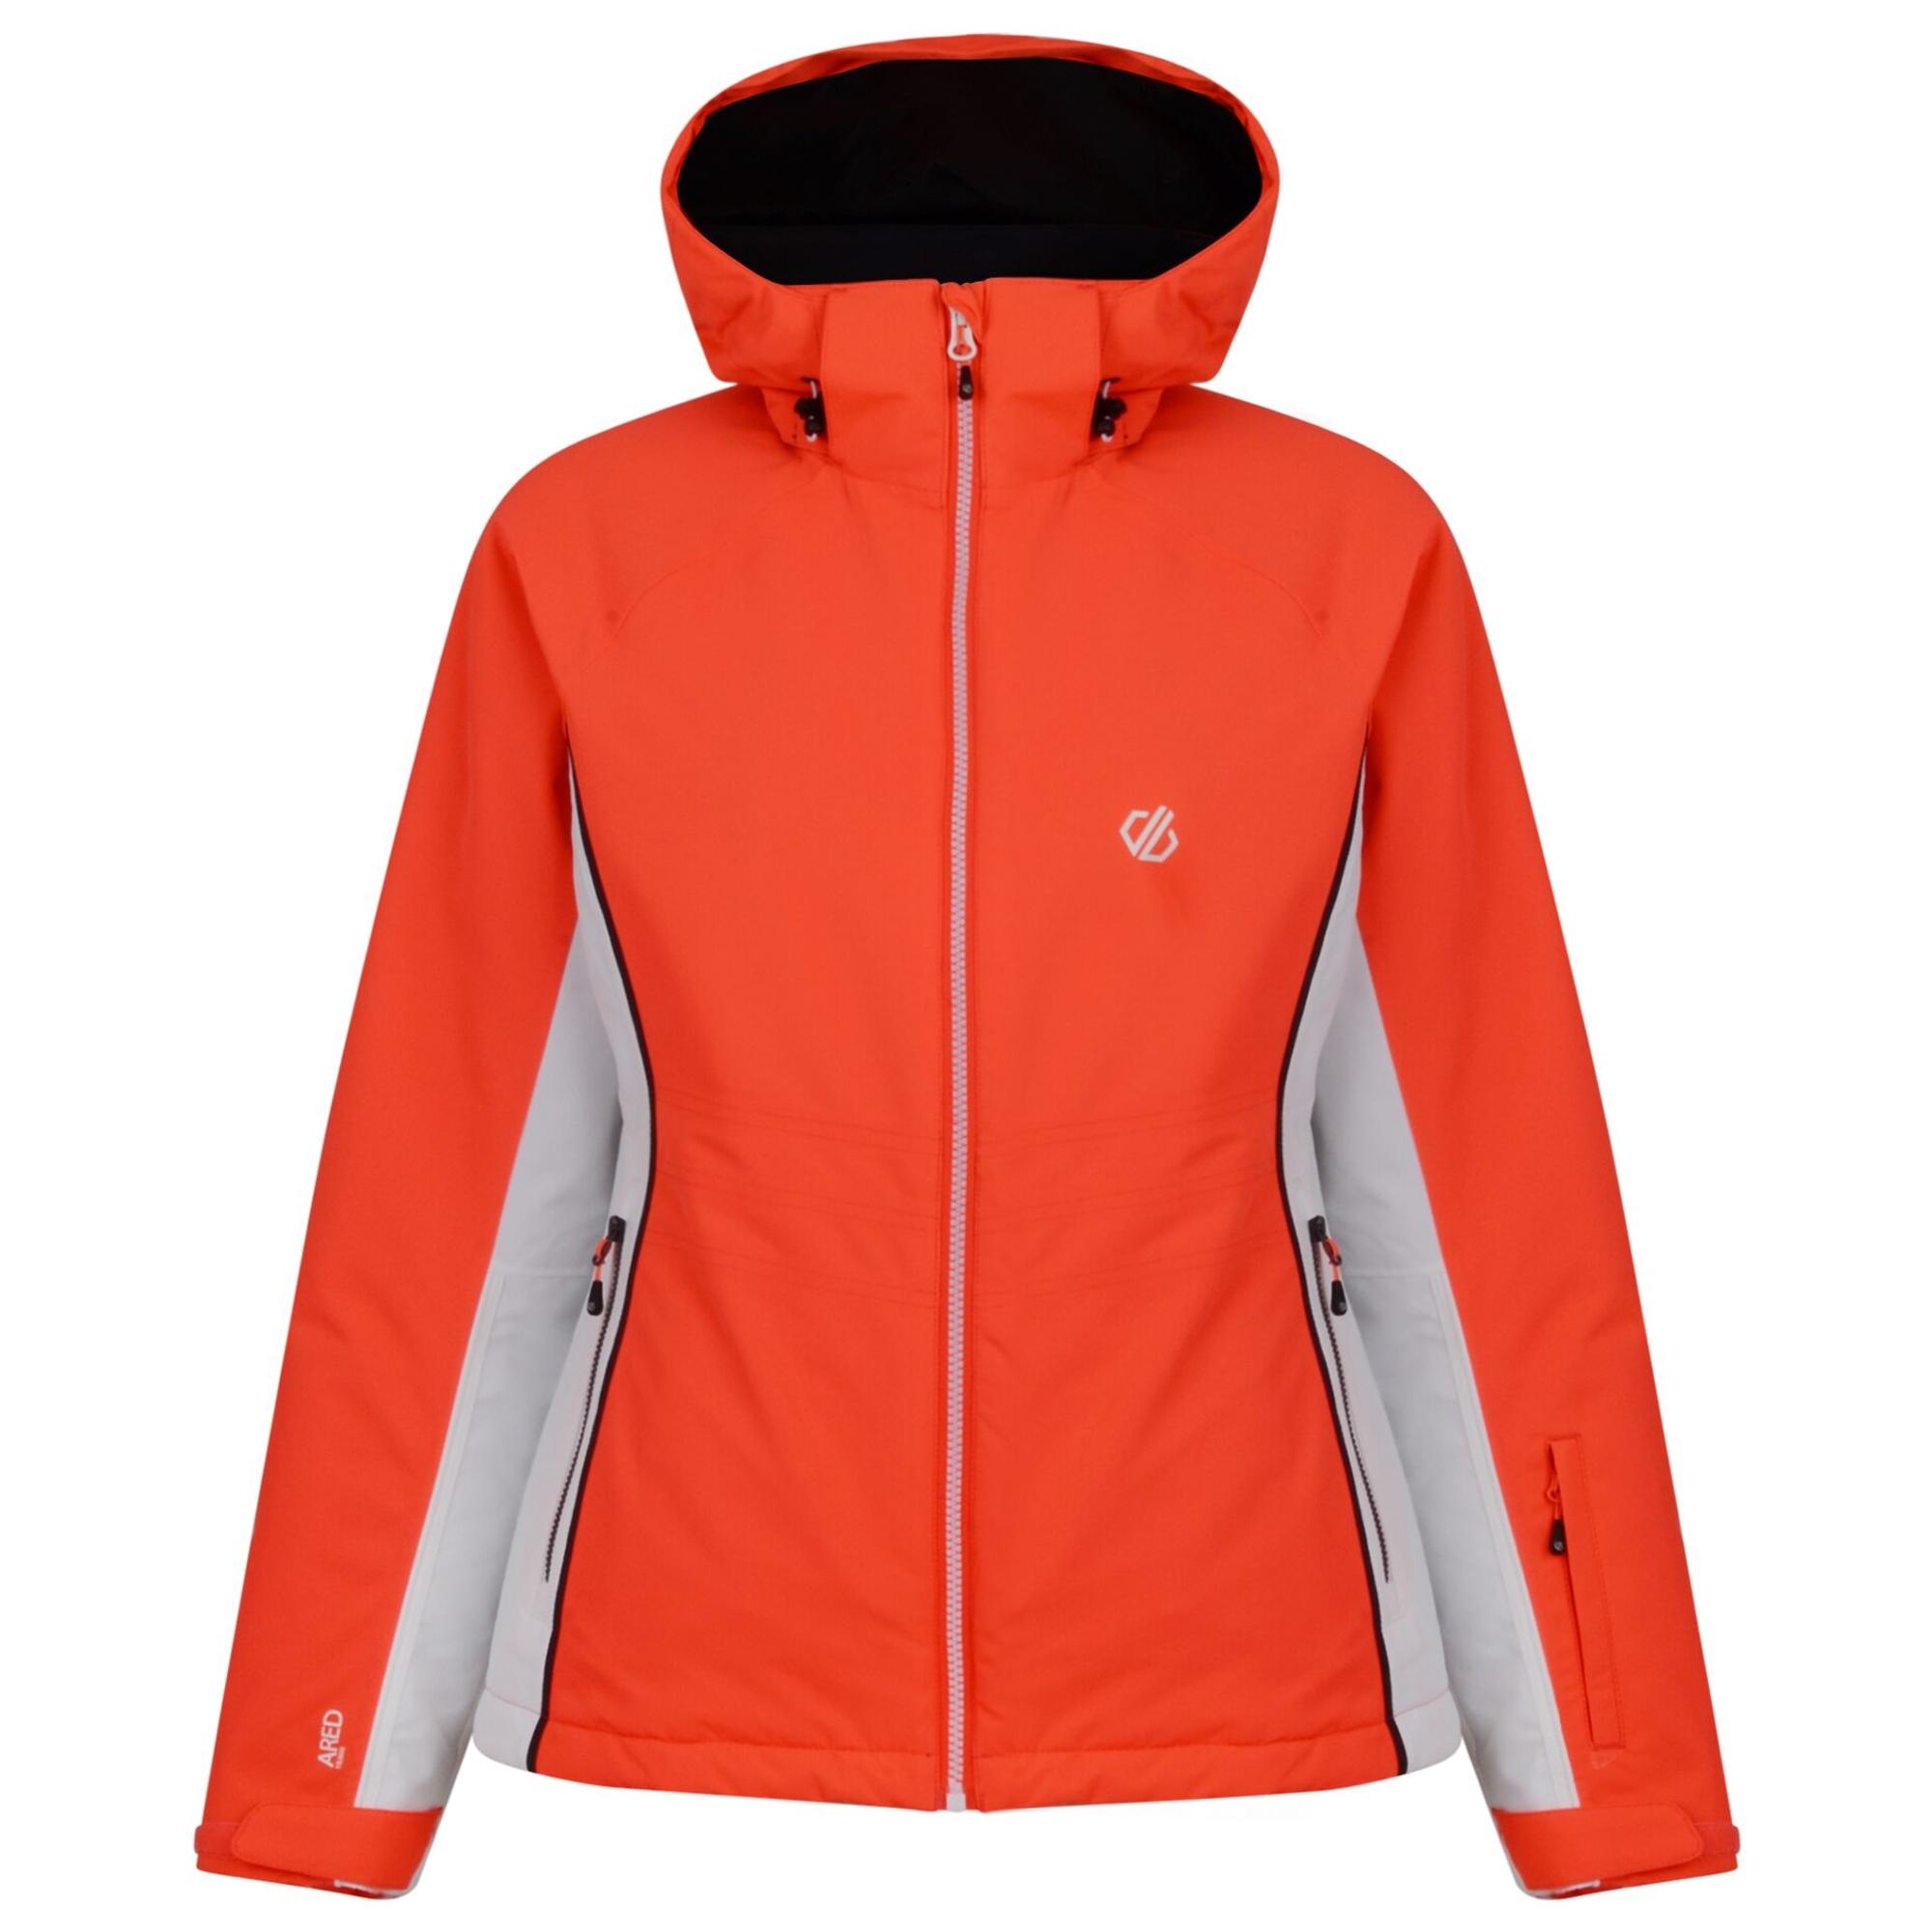 Dare 2b Womens/Ladies Thrive Ski Jacket (16 UK) (Fiery Coral)